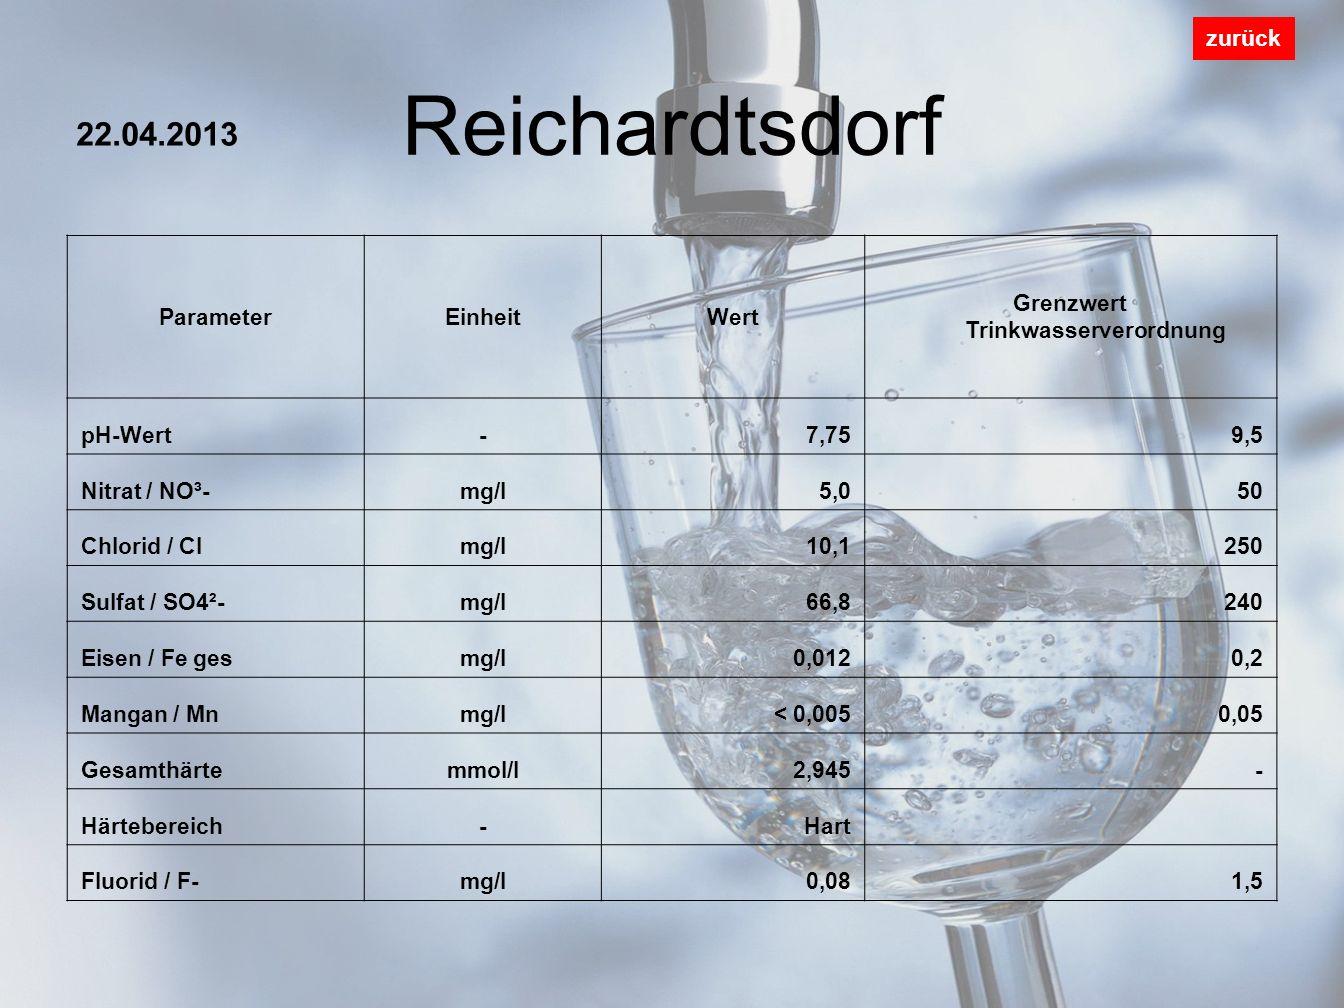 Pölzig zurück ParameterEinheitWert Grenzwert Trinkwasserverordnung pH-Wert-7,559,5 Nitrat / NO³-mg/l< 0,250 Chlorid / Clmg/l29,6250 Sulfat / SO4²-mg/l105240 Eisen / Fe gesmg/l<0,0100,2 Mangan / Mnmg/l< 0,0050,05 Gesamthärtemmol/l4,465- Härtebereich-Hart Fluorid / F-mg/l0,131,5 18.03.2013